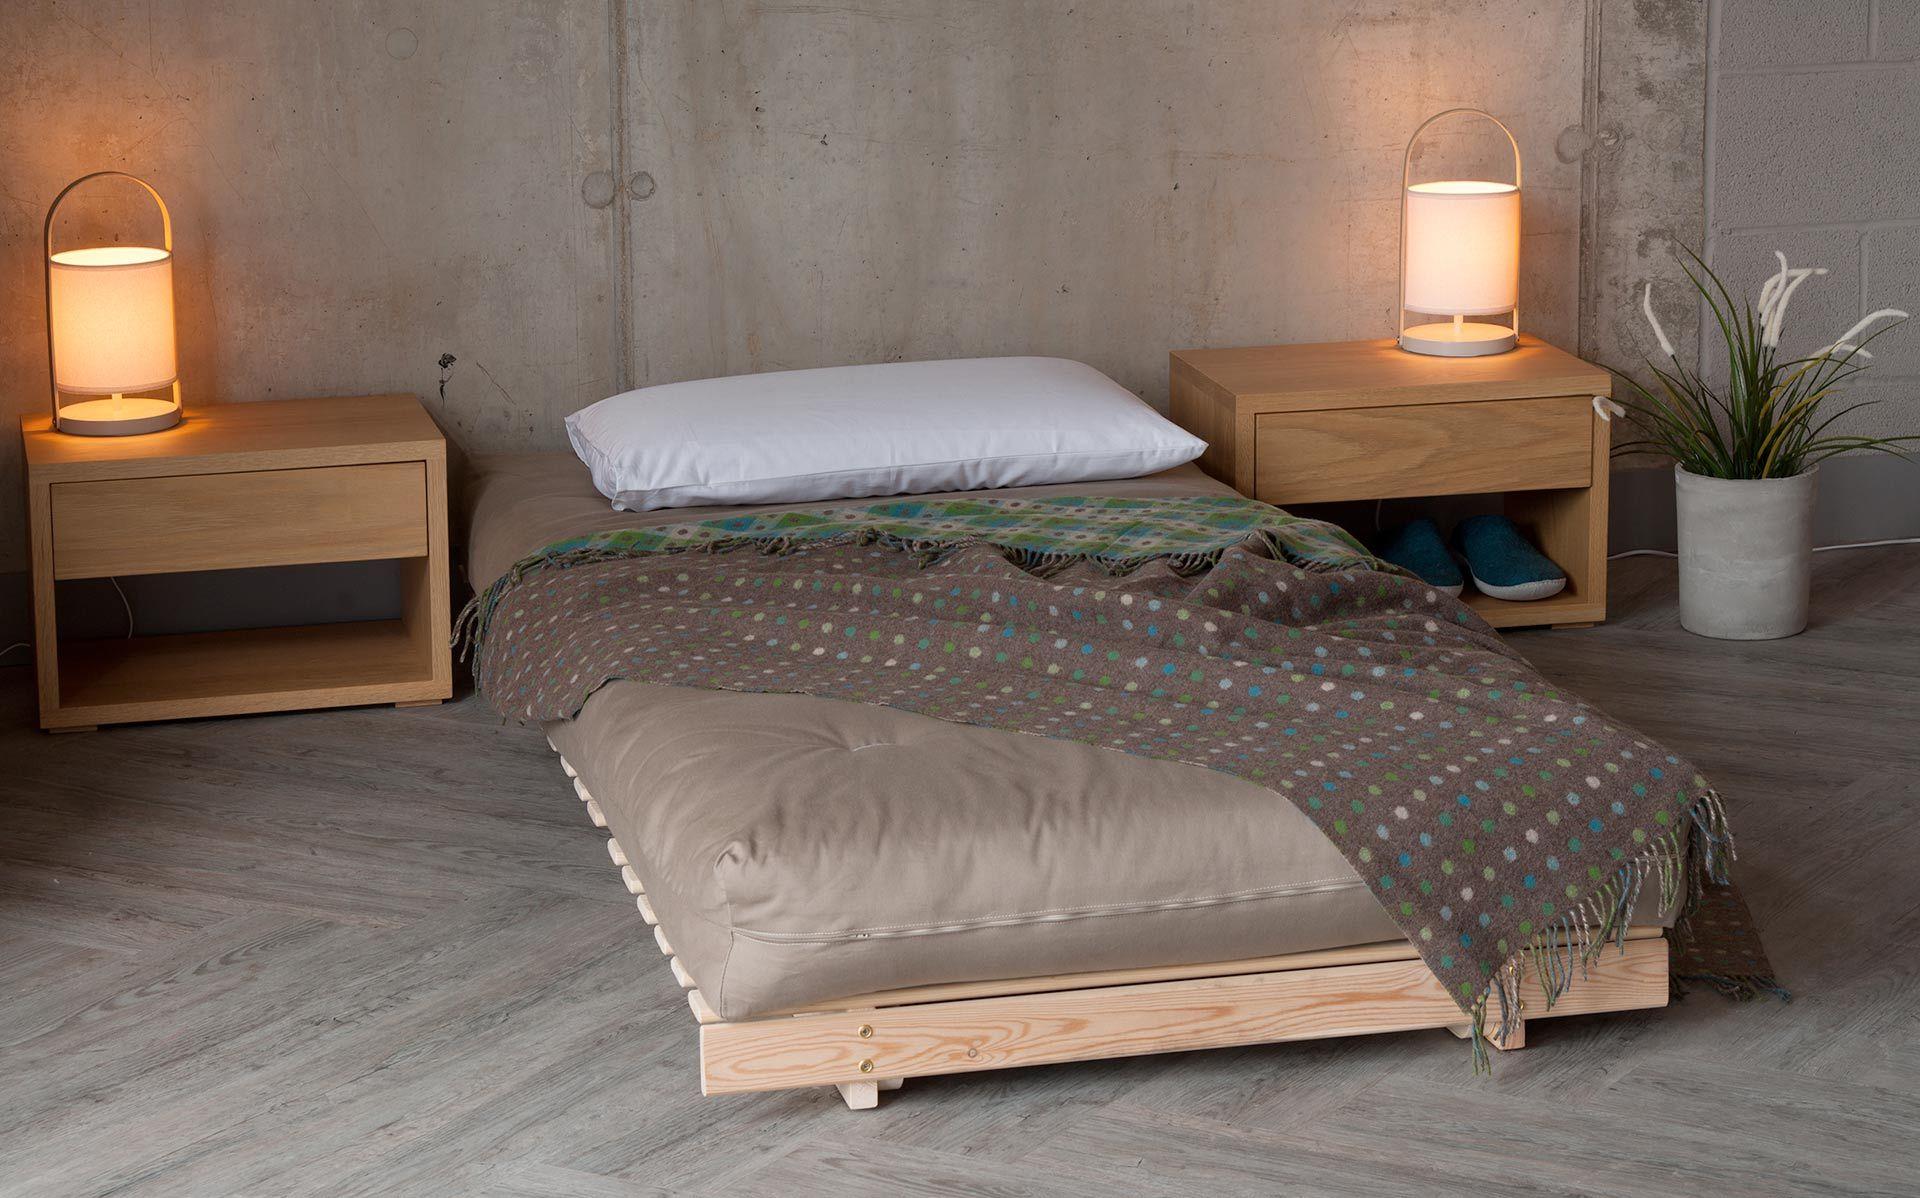 Tokyo Sofa Bed Futon sofa, Futon bedroom, Futon sofa bed